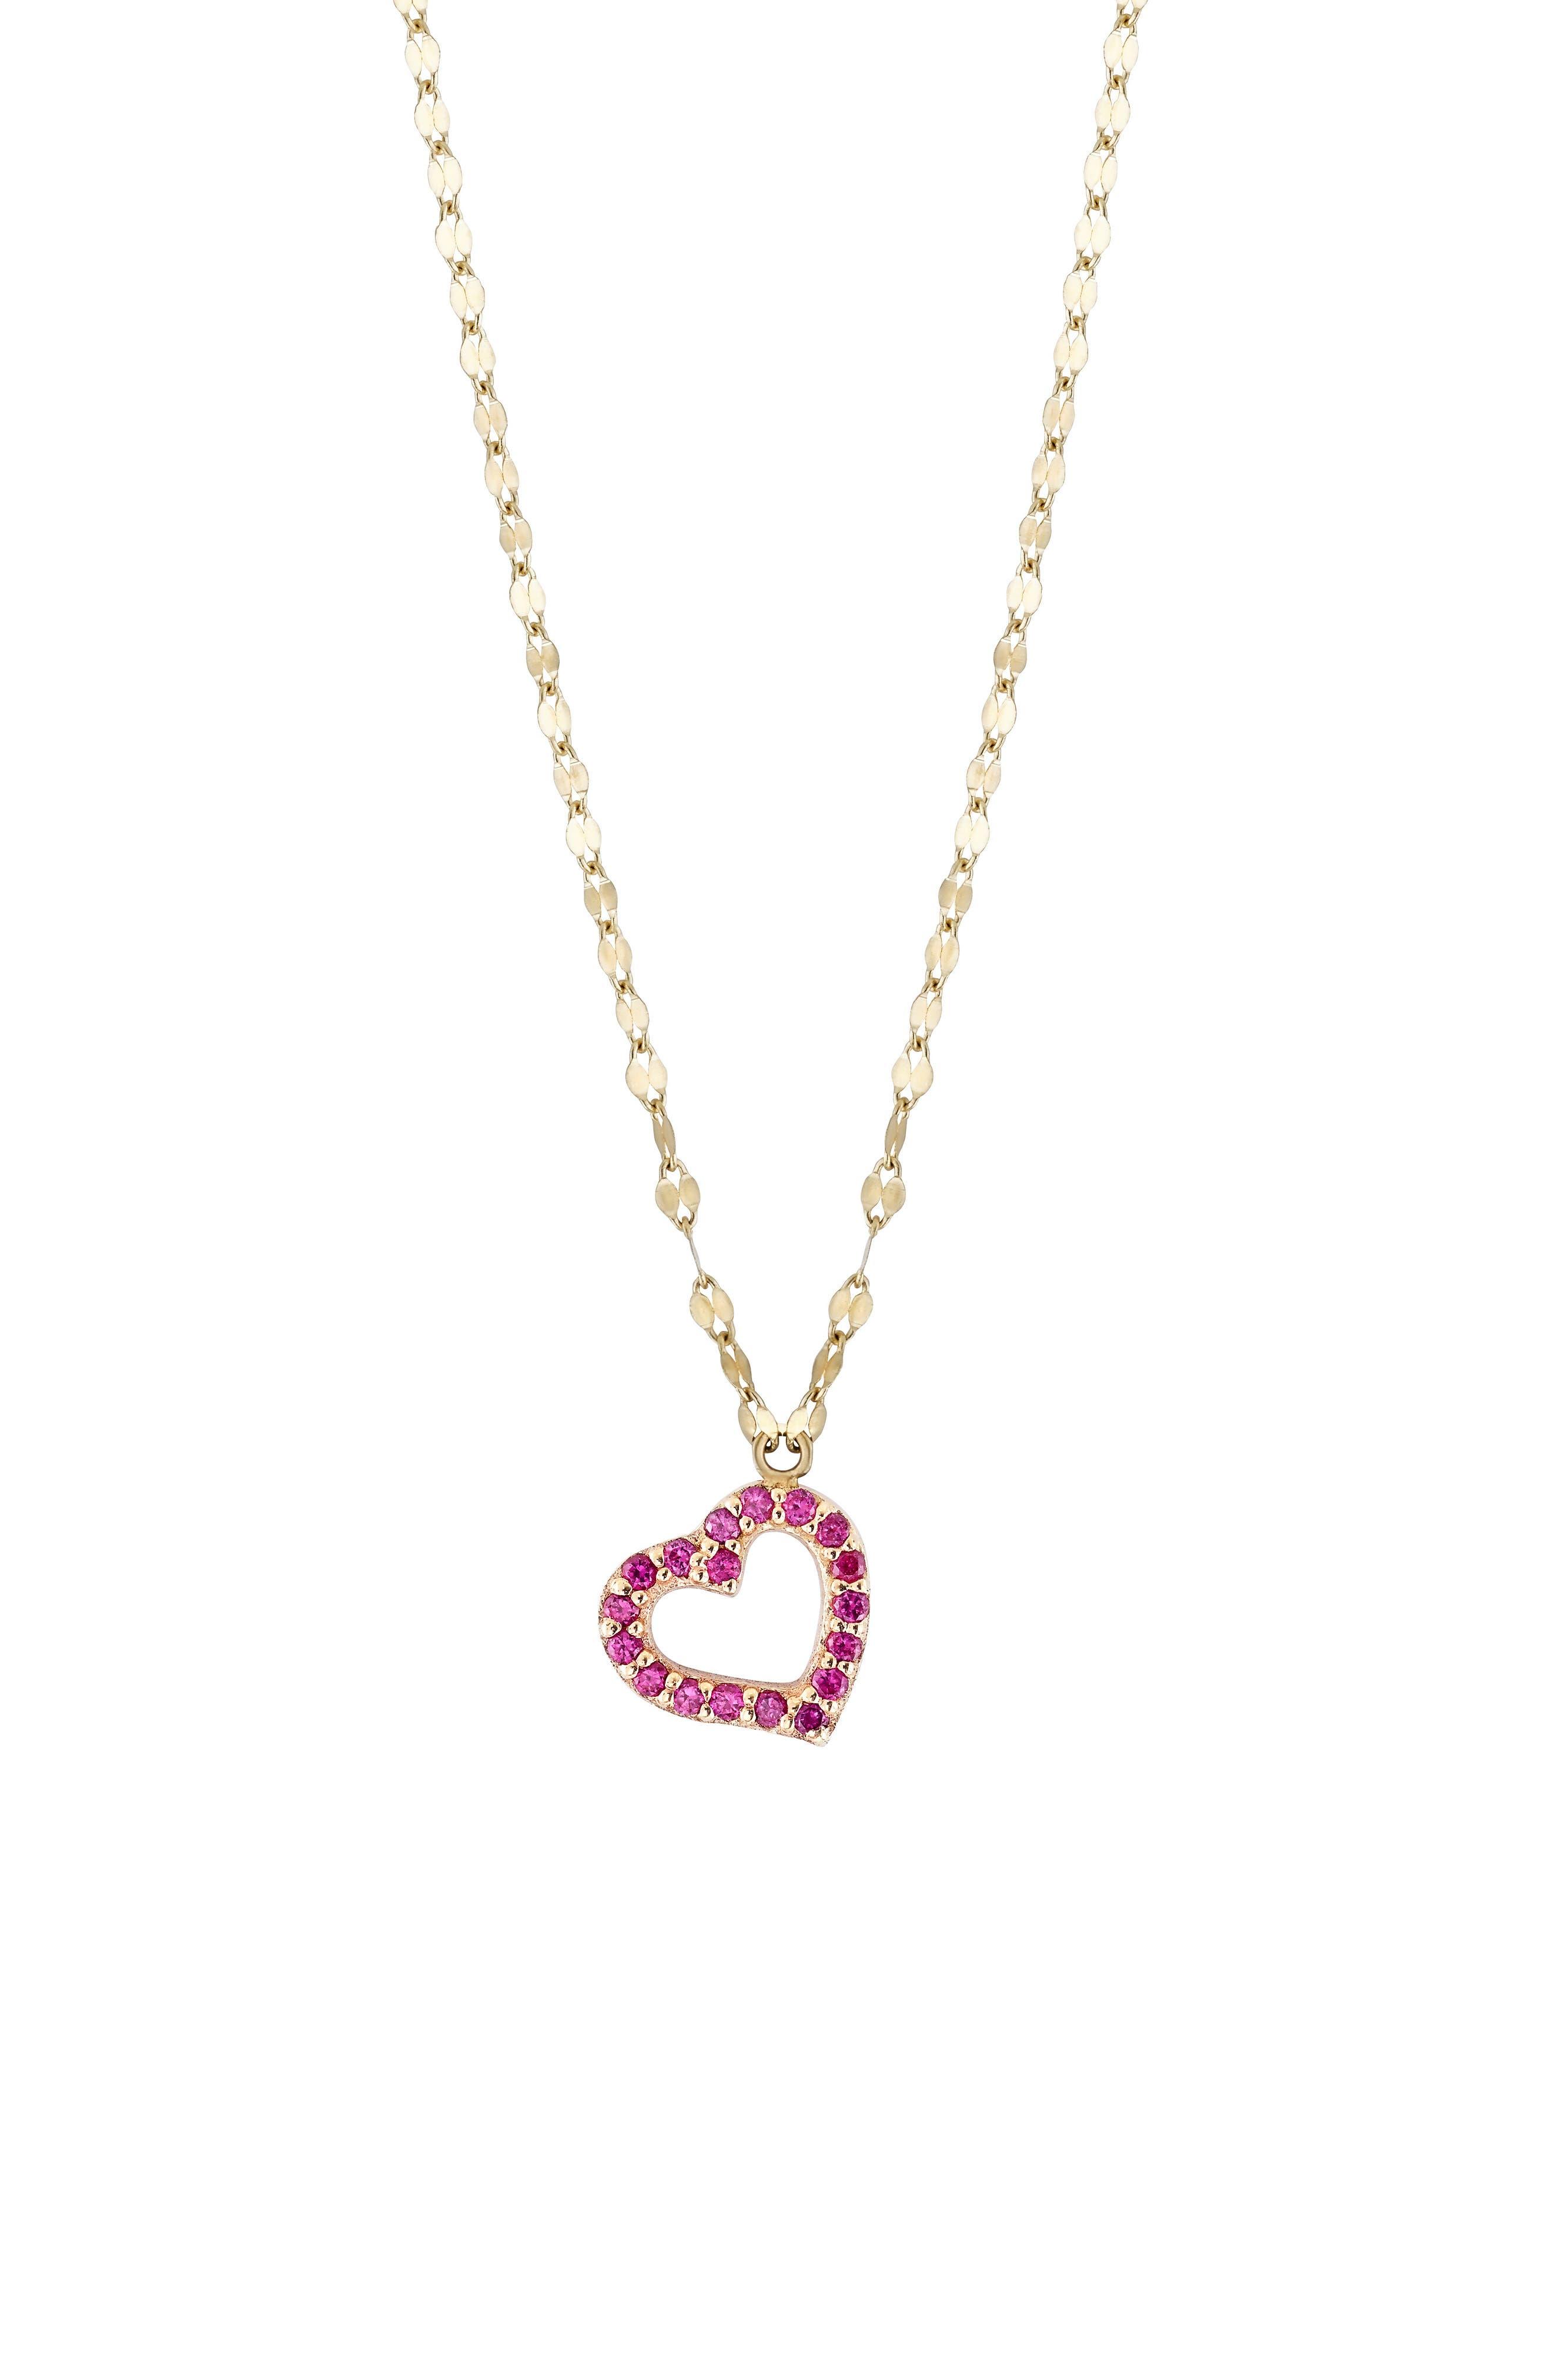 Mini Heart Pendant Necklace,                             Main thumbnail 1, color,                             YELLOW GOLD